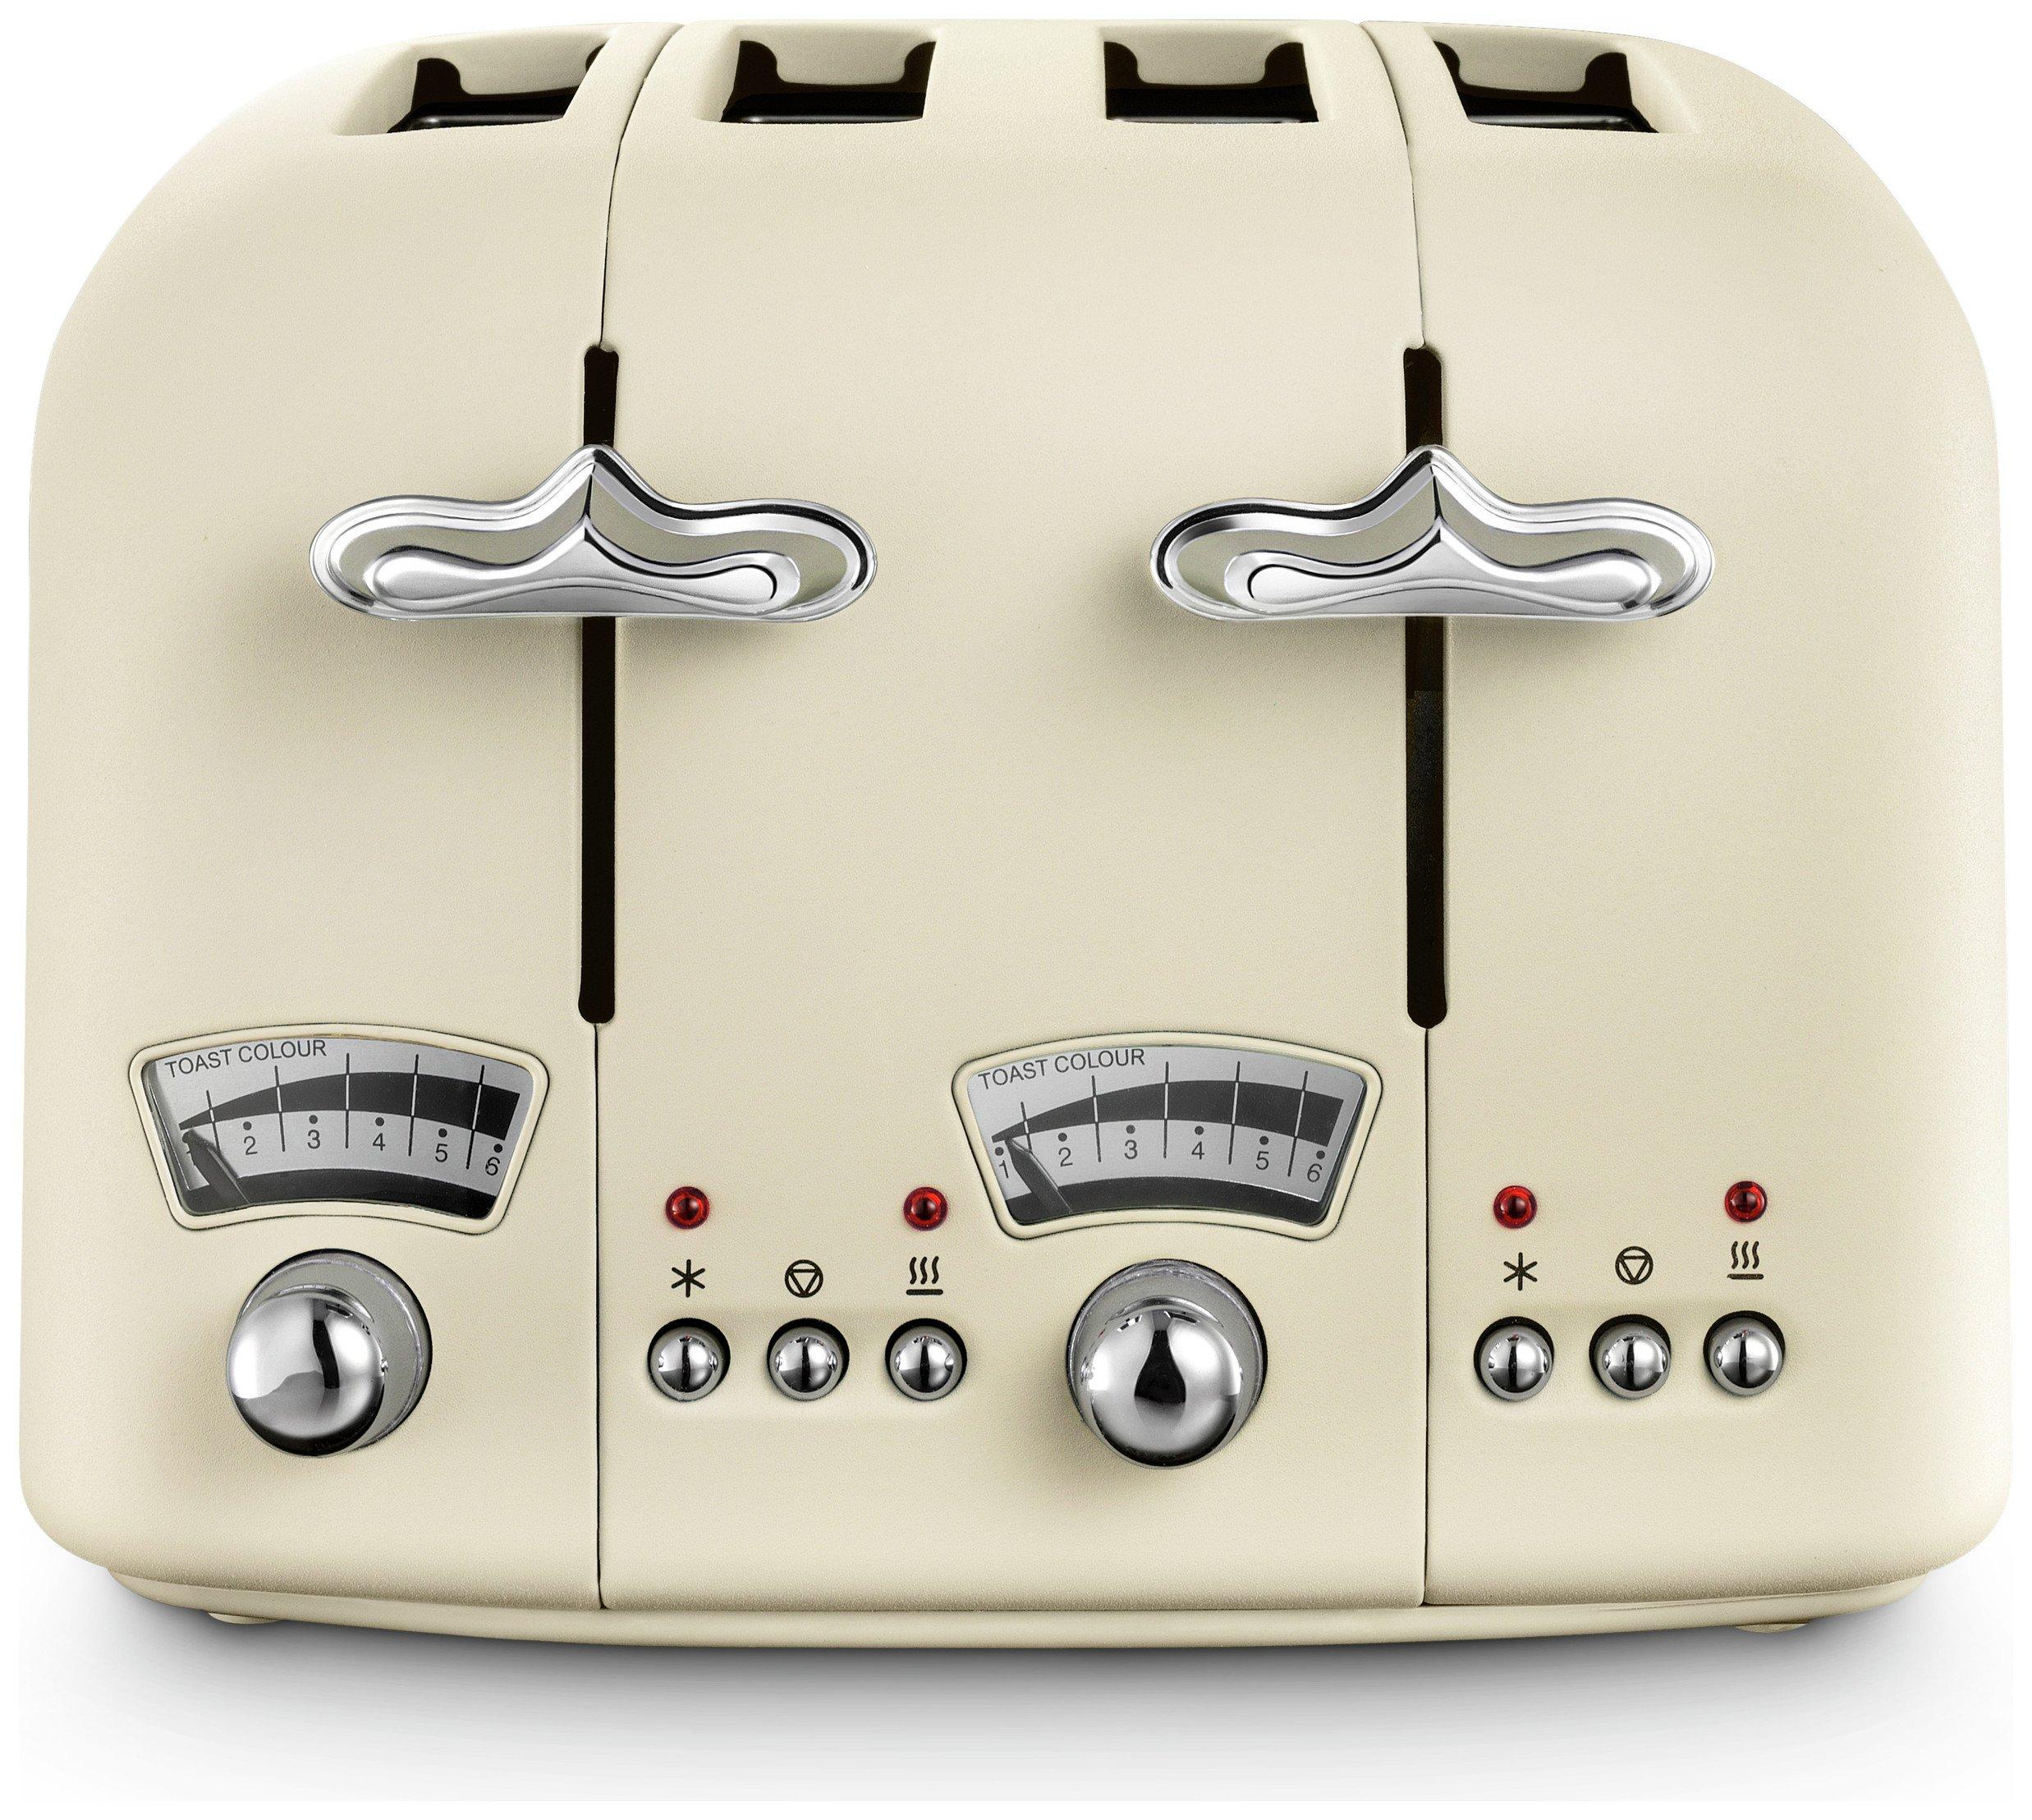 De'Longhi CTO4 Argento Flora 4 Slice Toaster - Beige